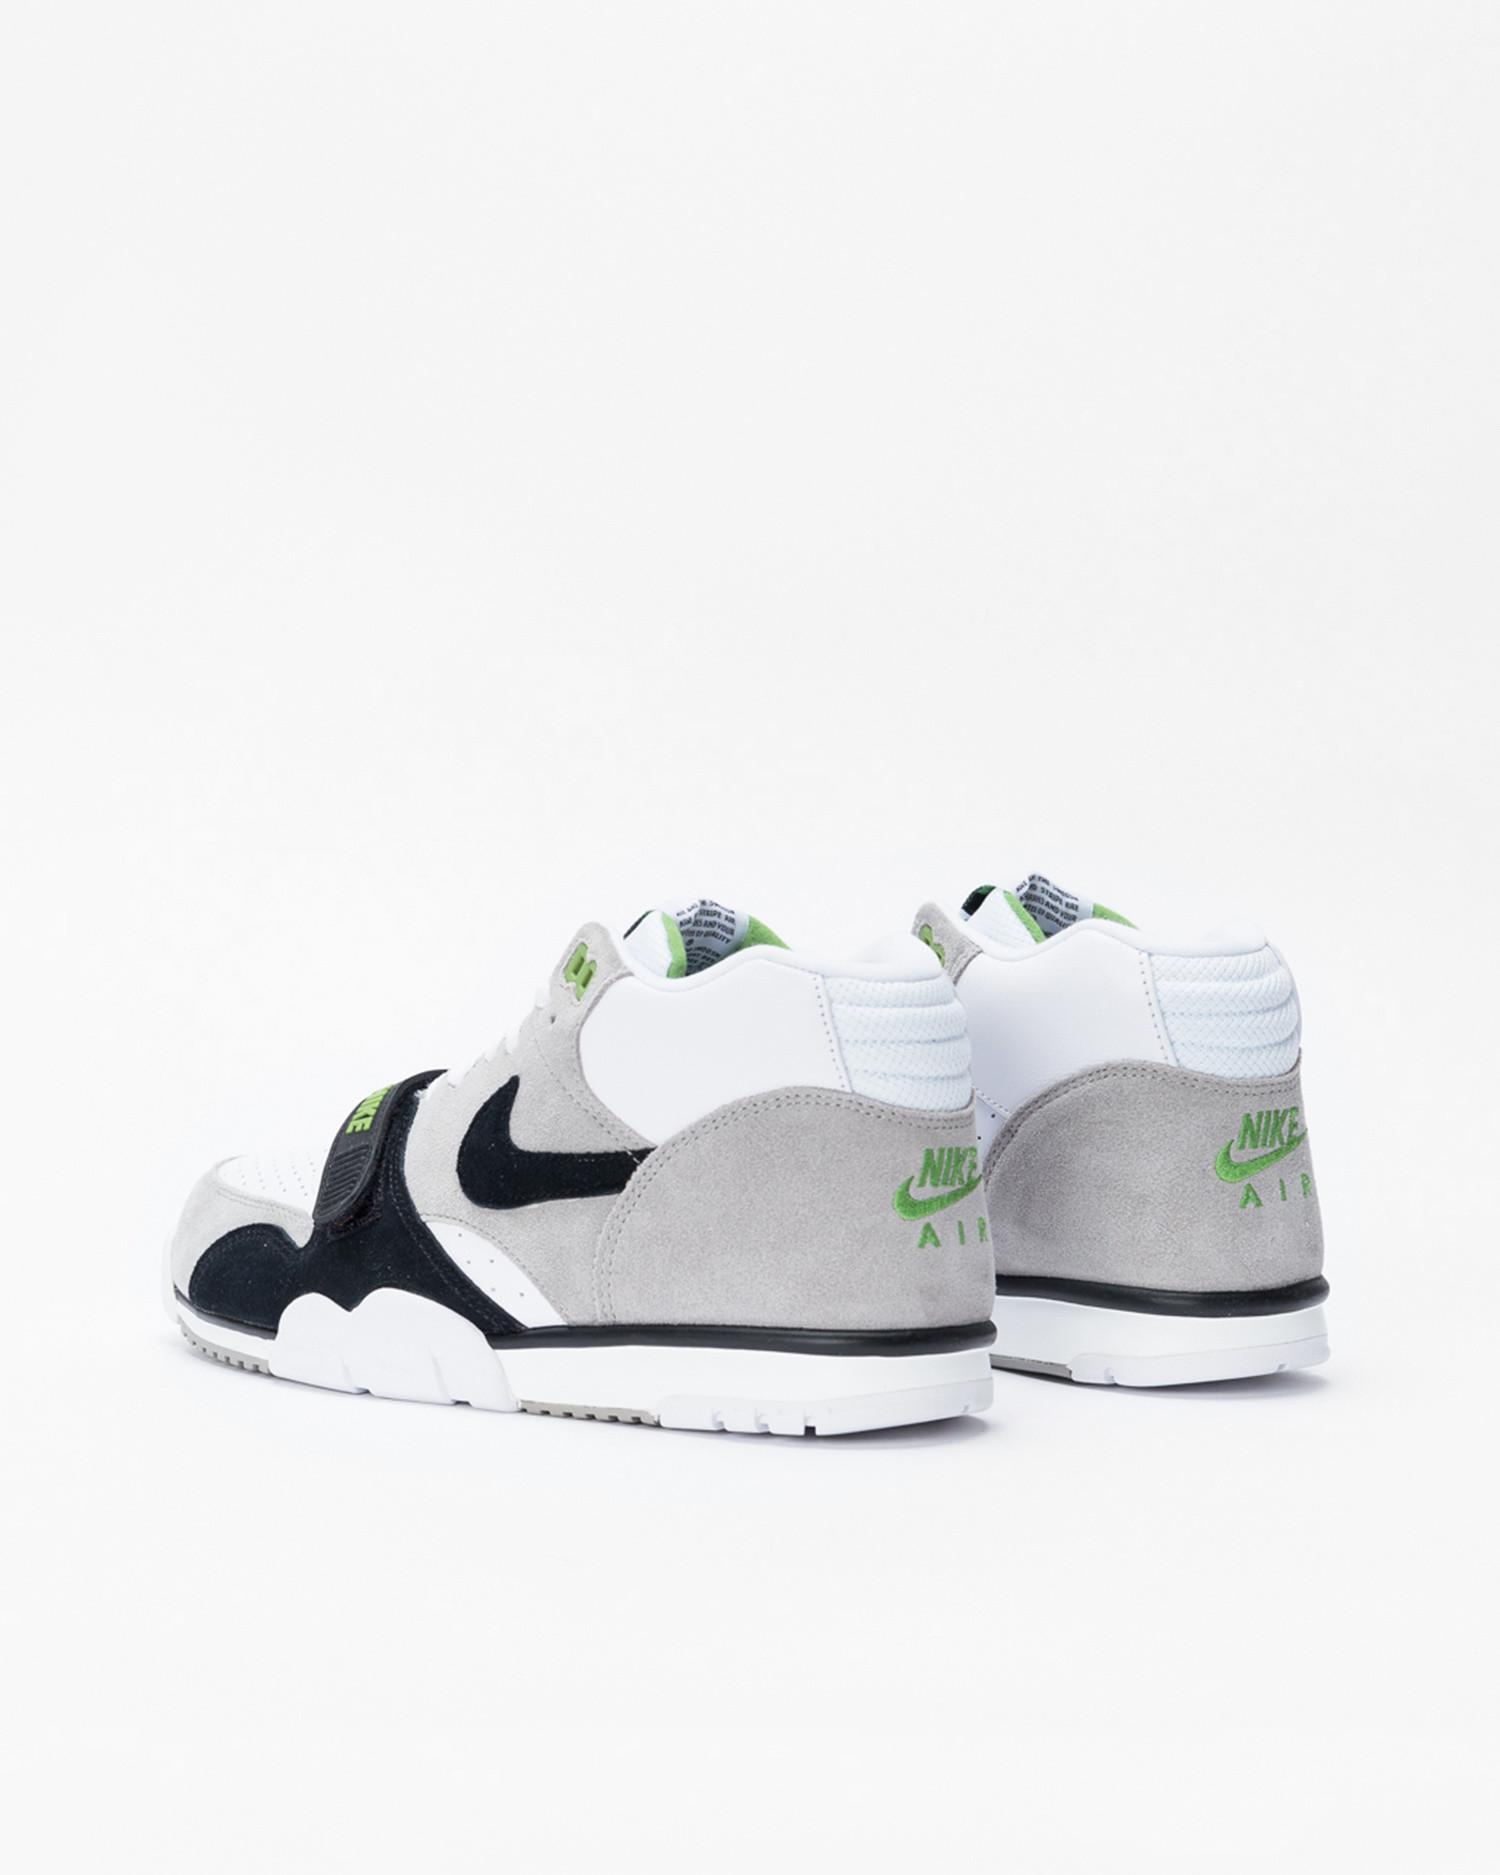 Nike Sb Air Trainer Iso Medium Grey/black-white-chlorophyll